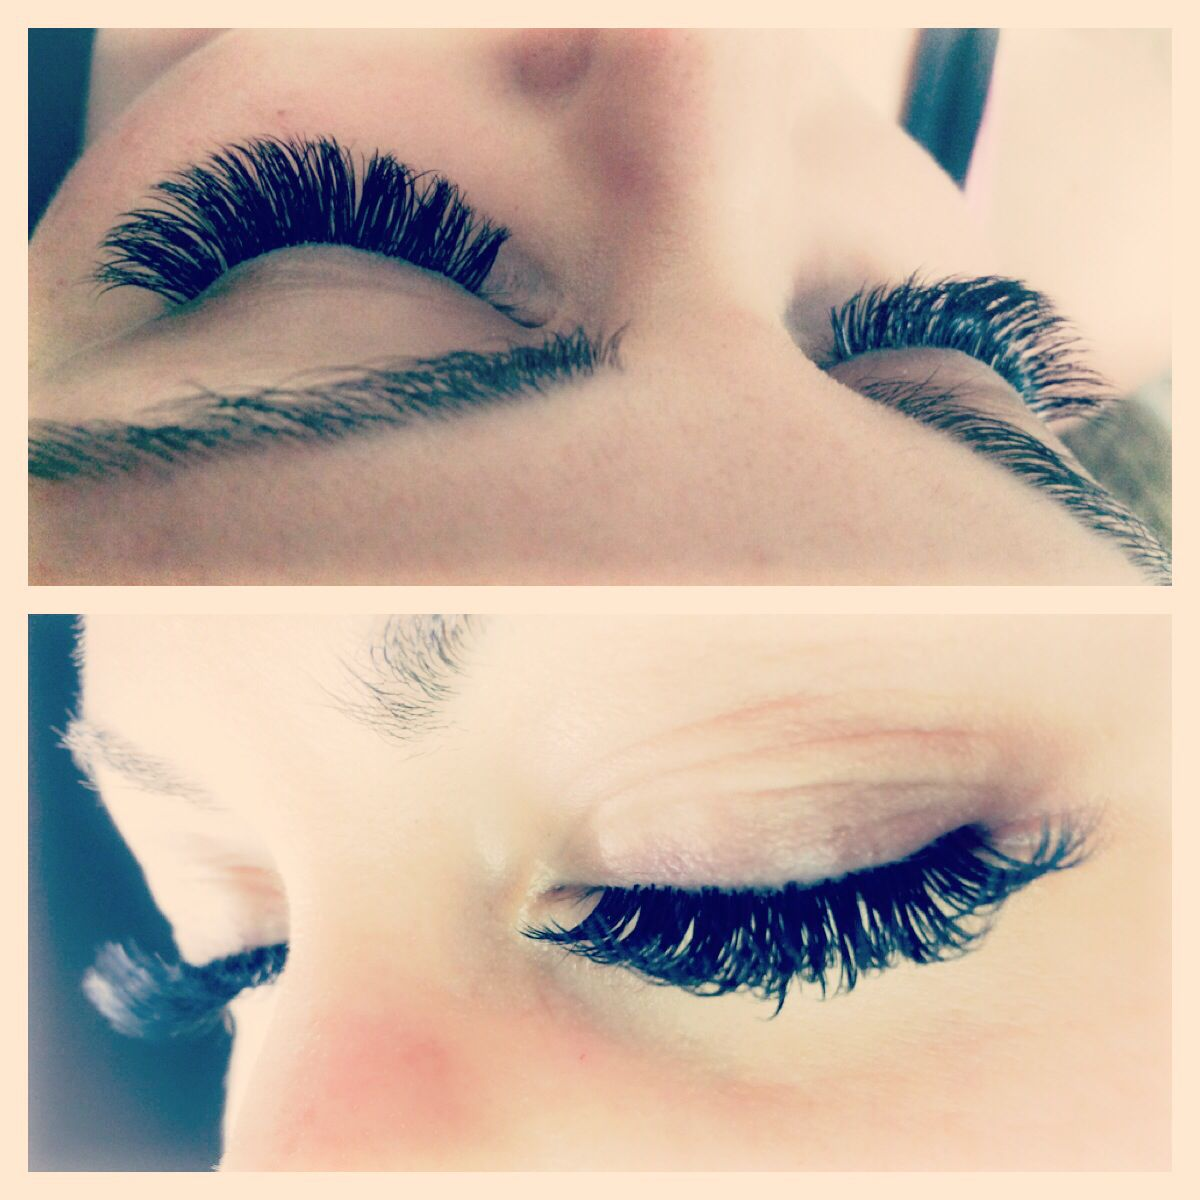 Billige lash extensions